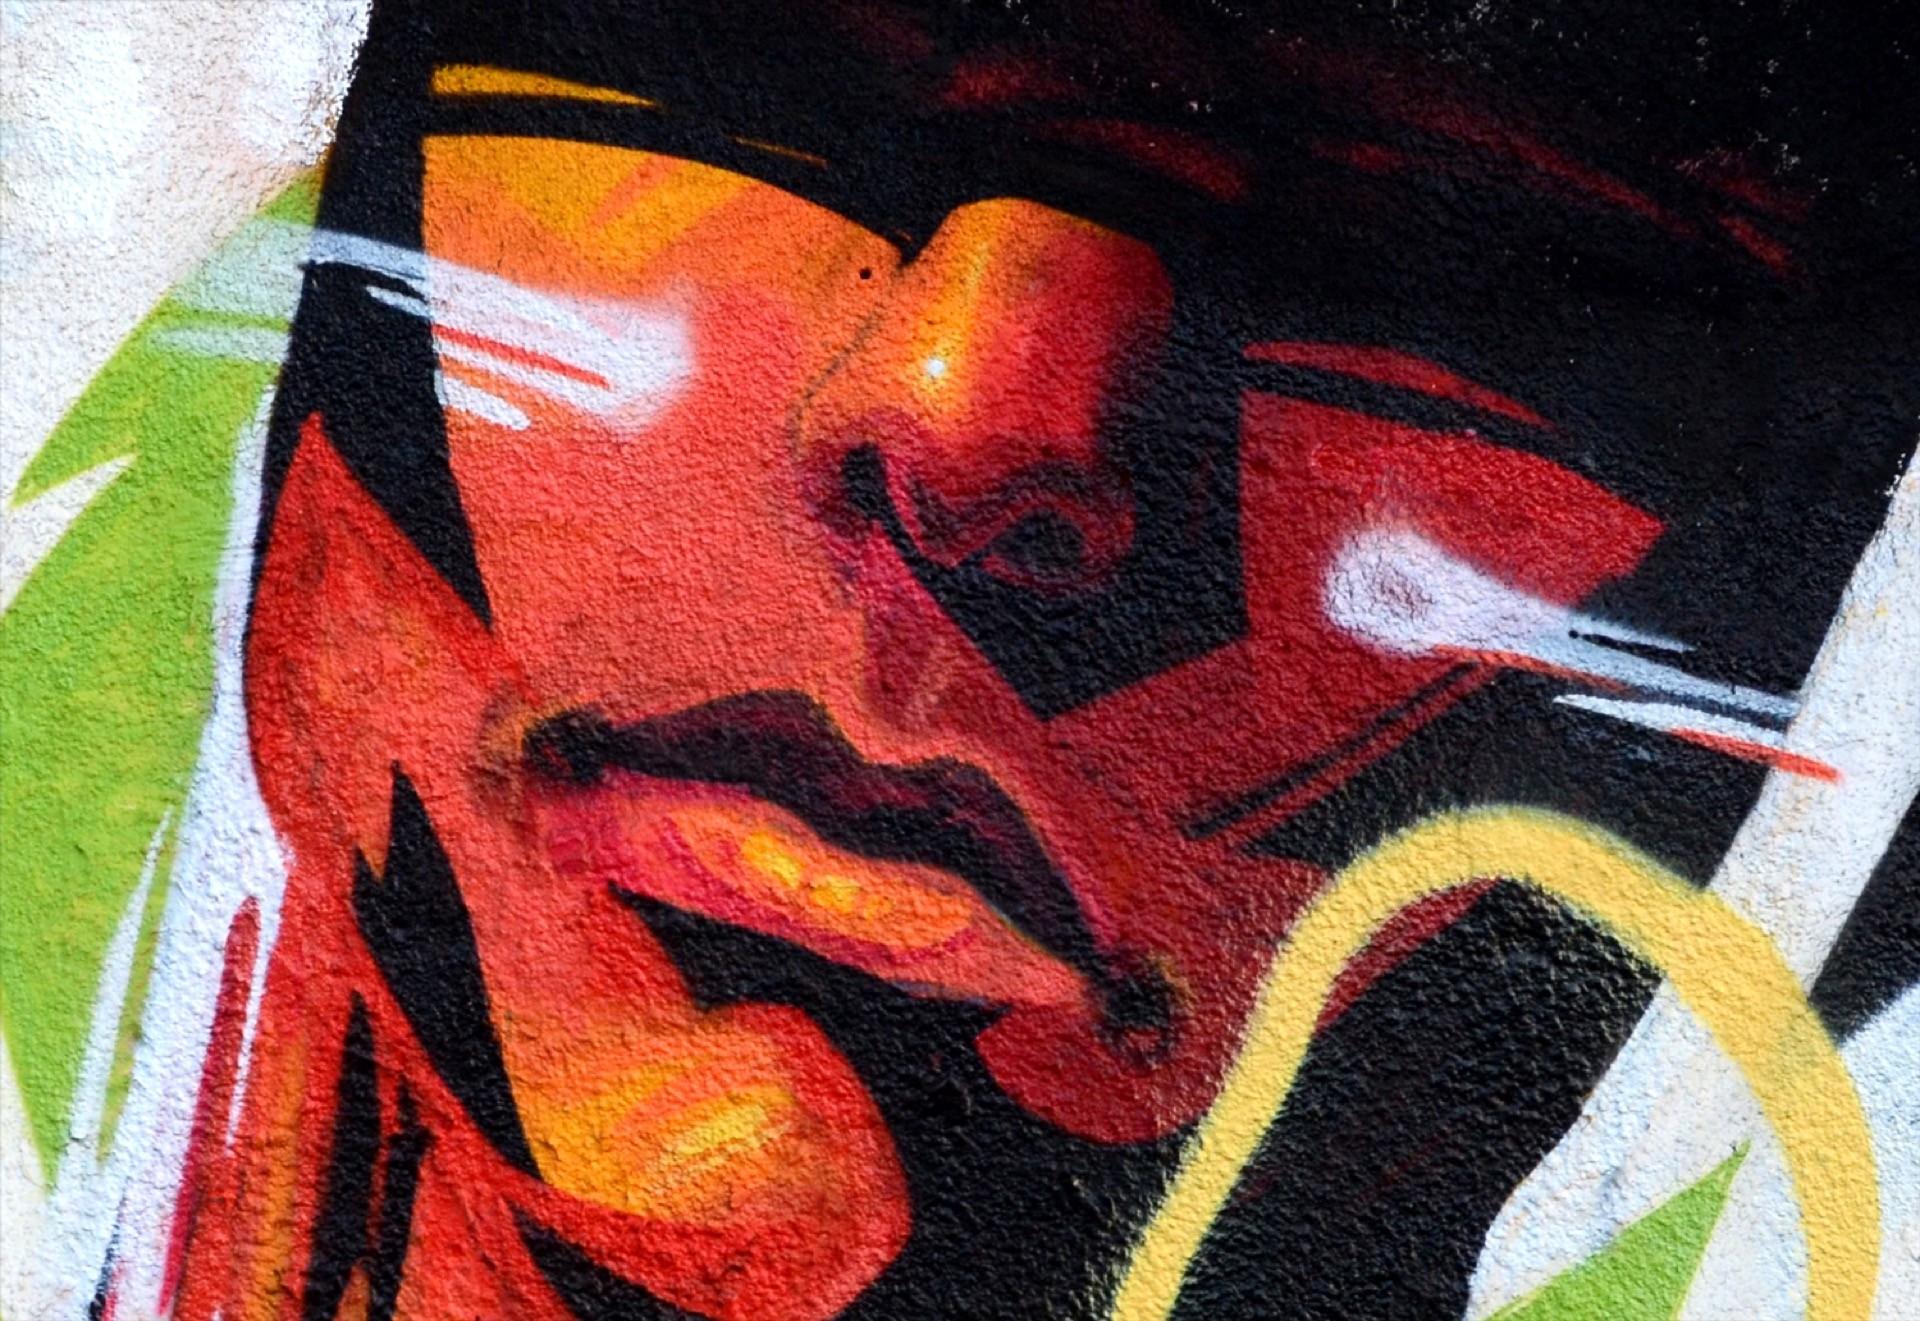 UNTAY mural tel aviv 04